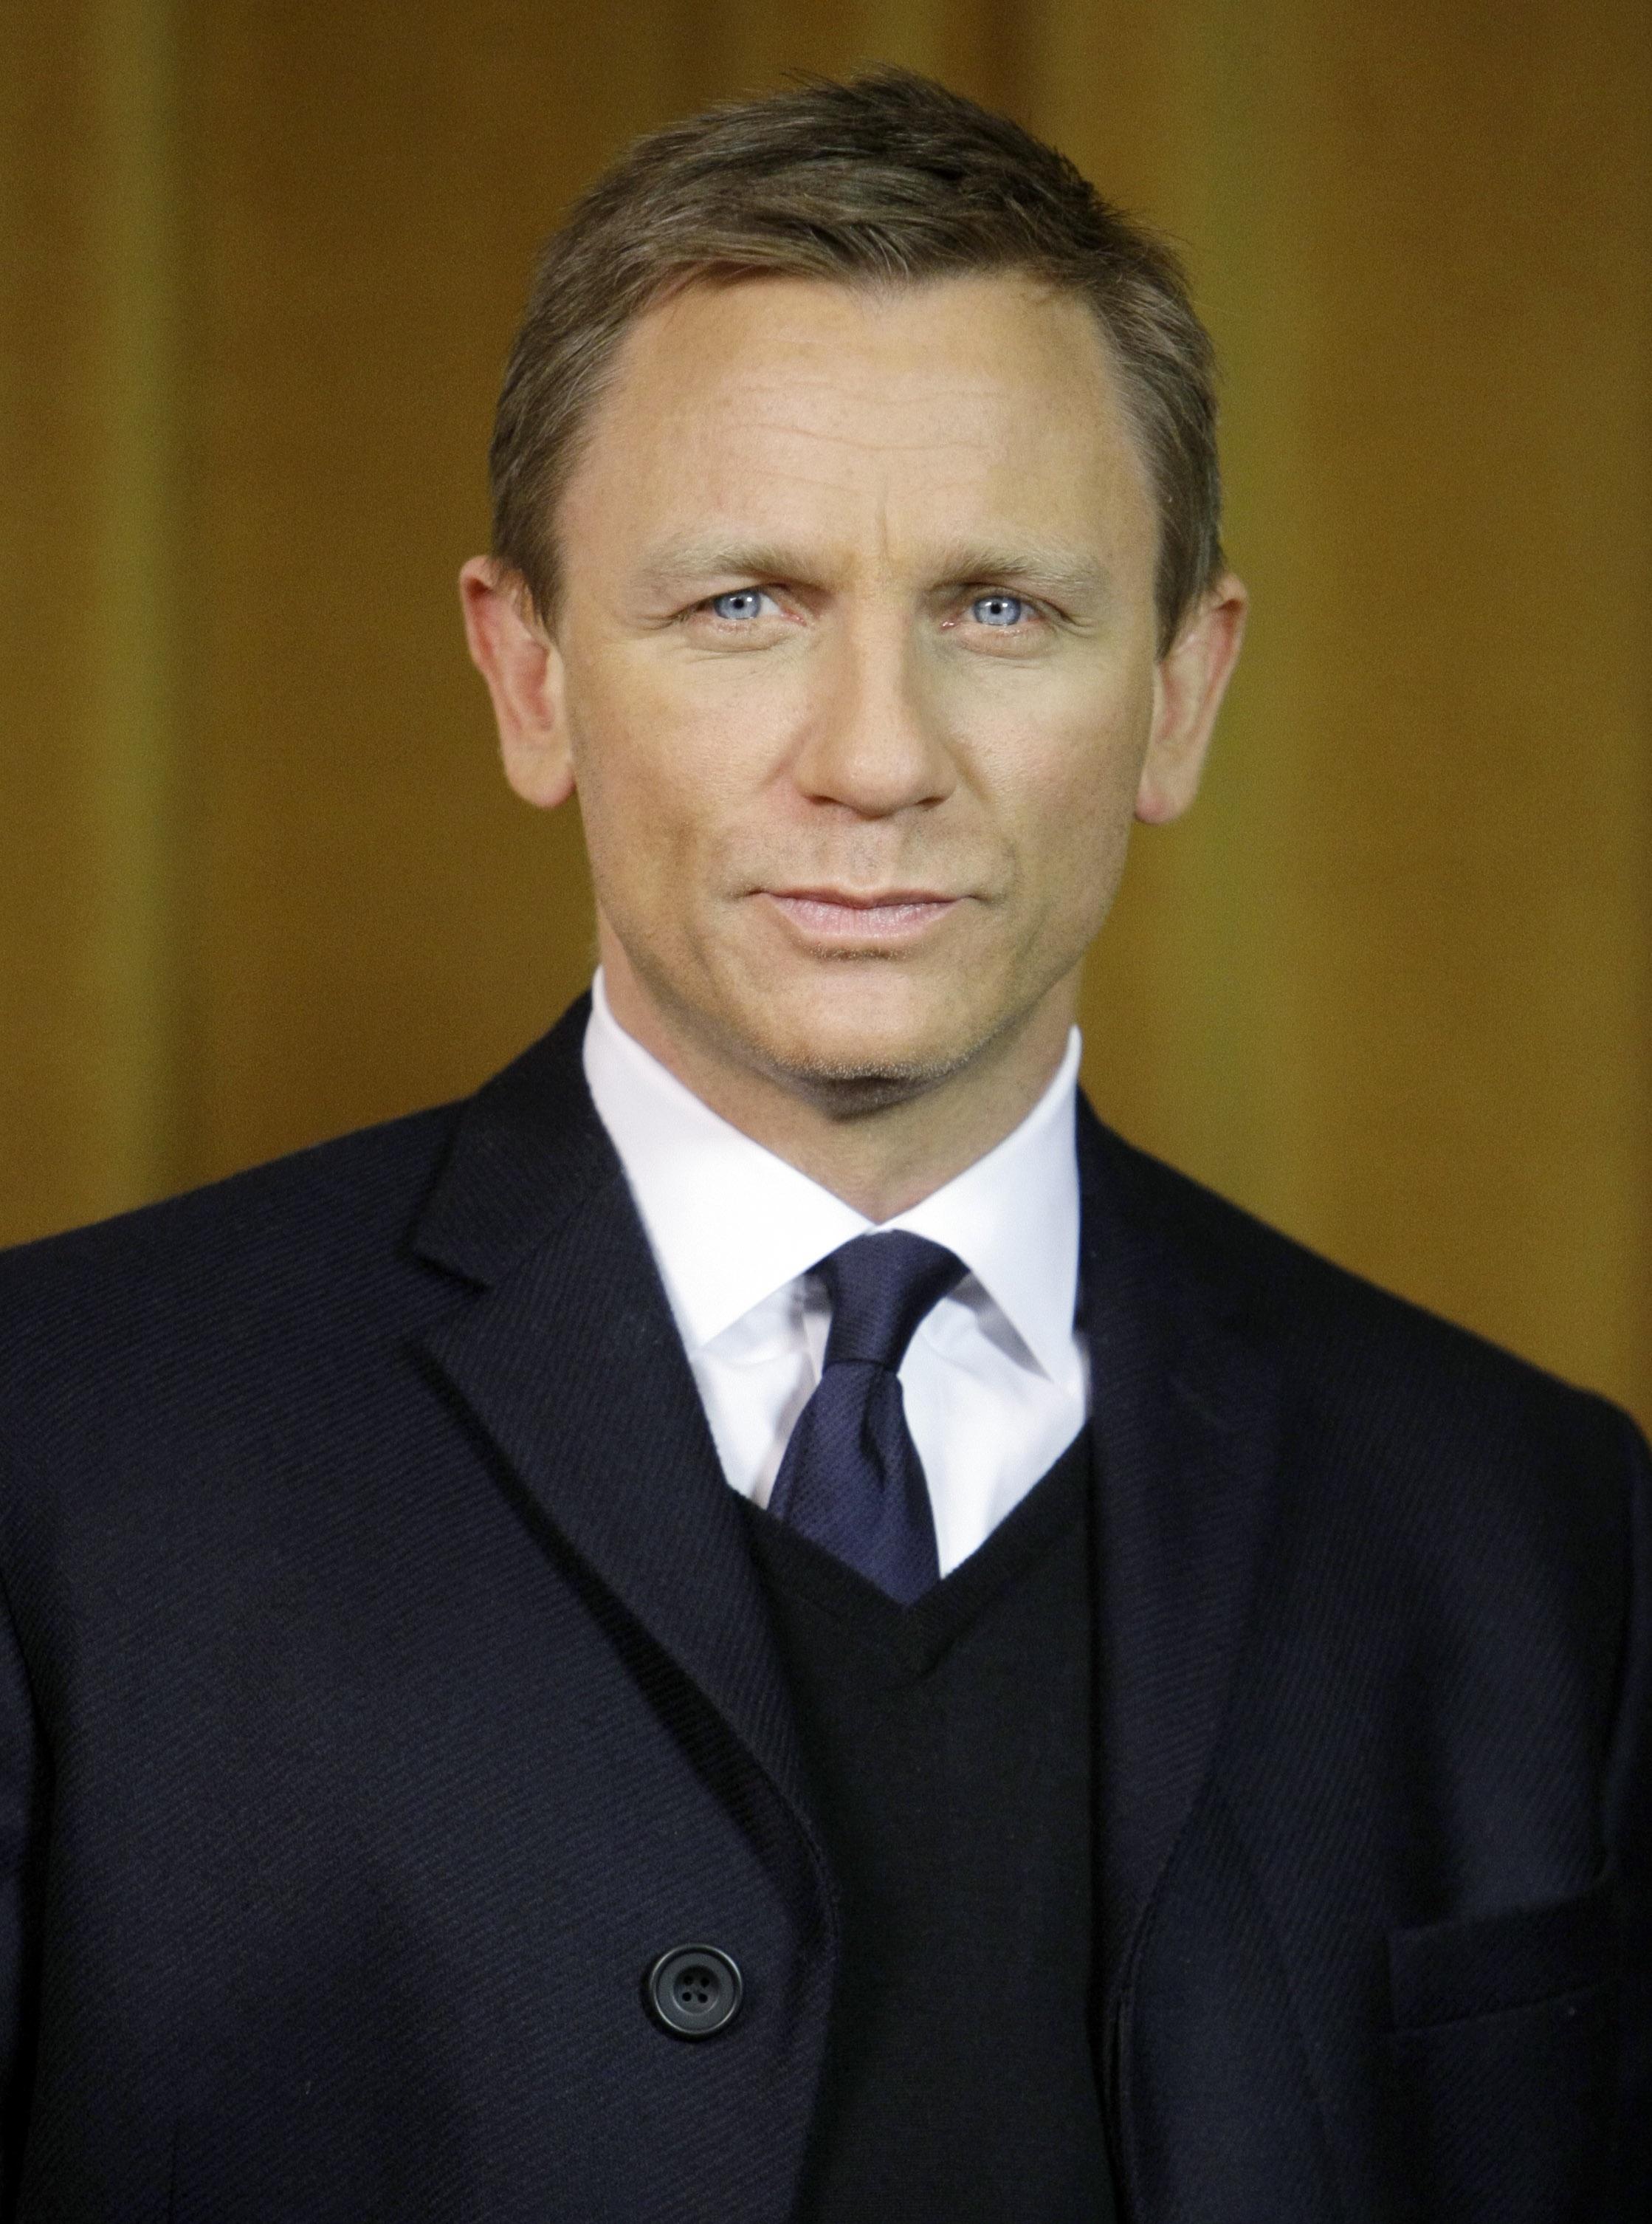 090119045996 Daniel Craig